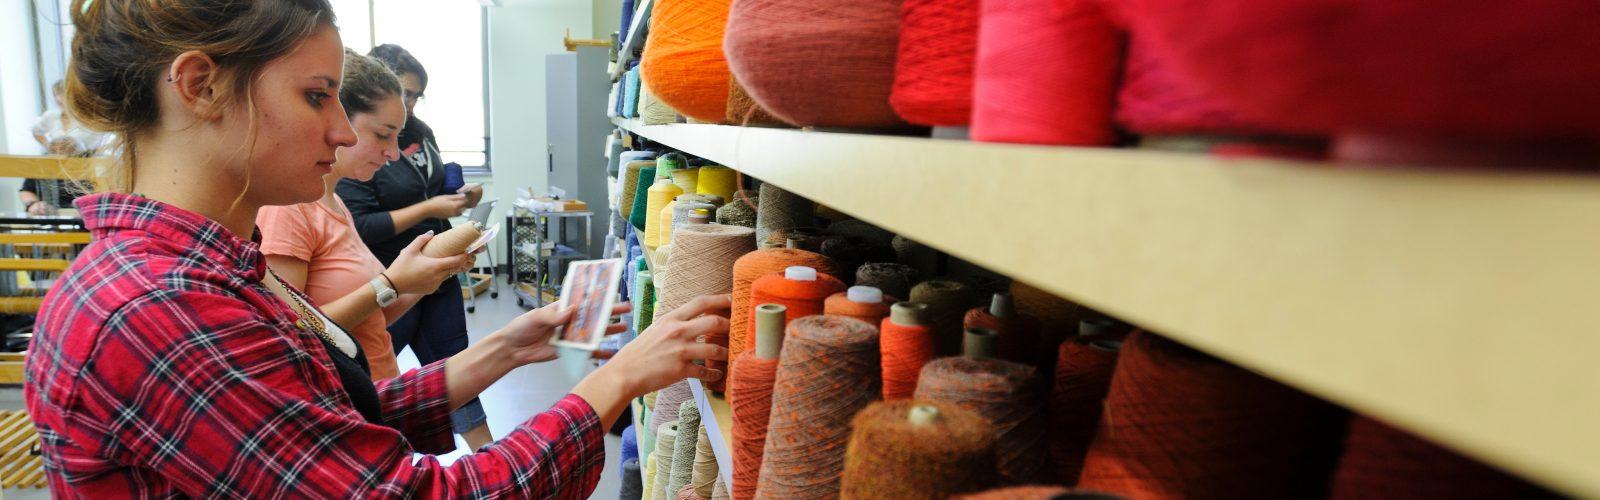 SoHE weaving class